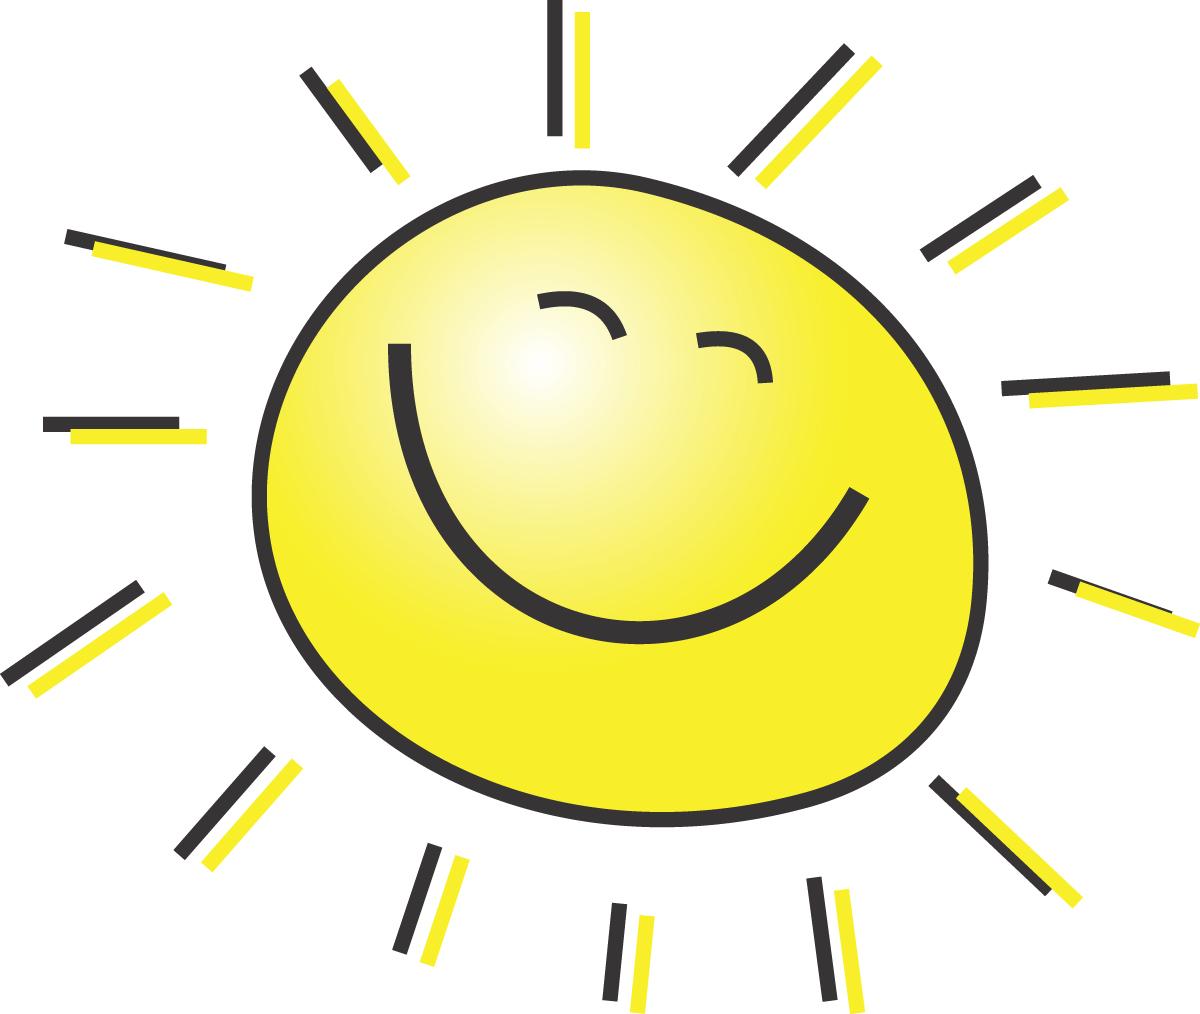 Sun With Sunglasses Clipart | Clipart Li-Sun With Sunglasses Clipart | Clipart library - Free Clipart Images-6